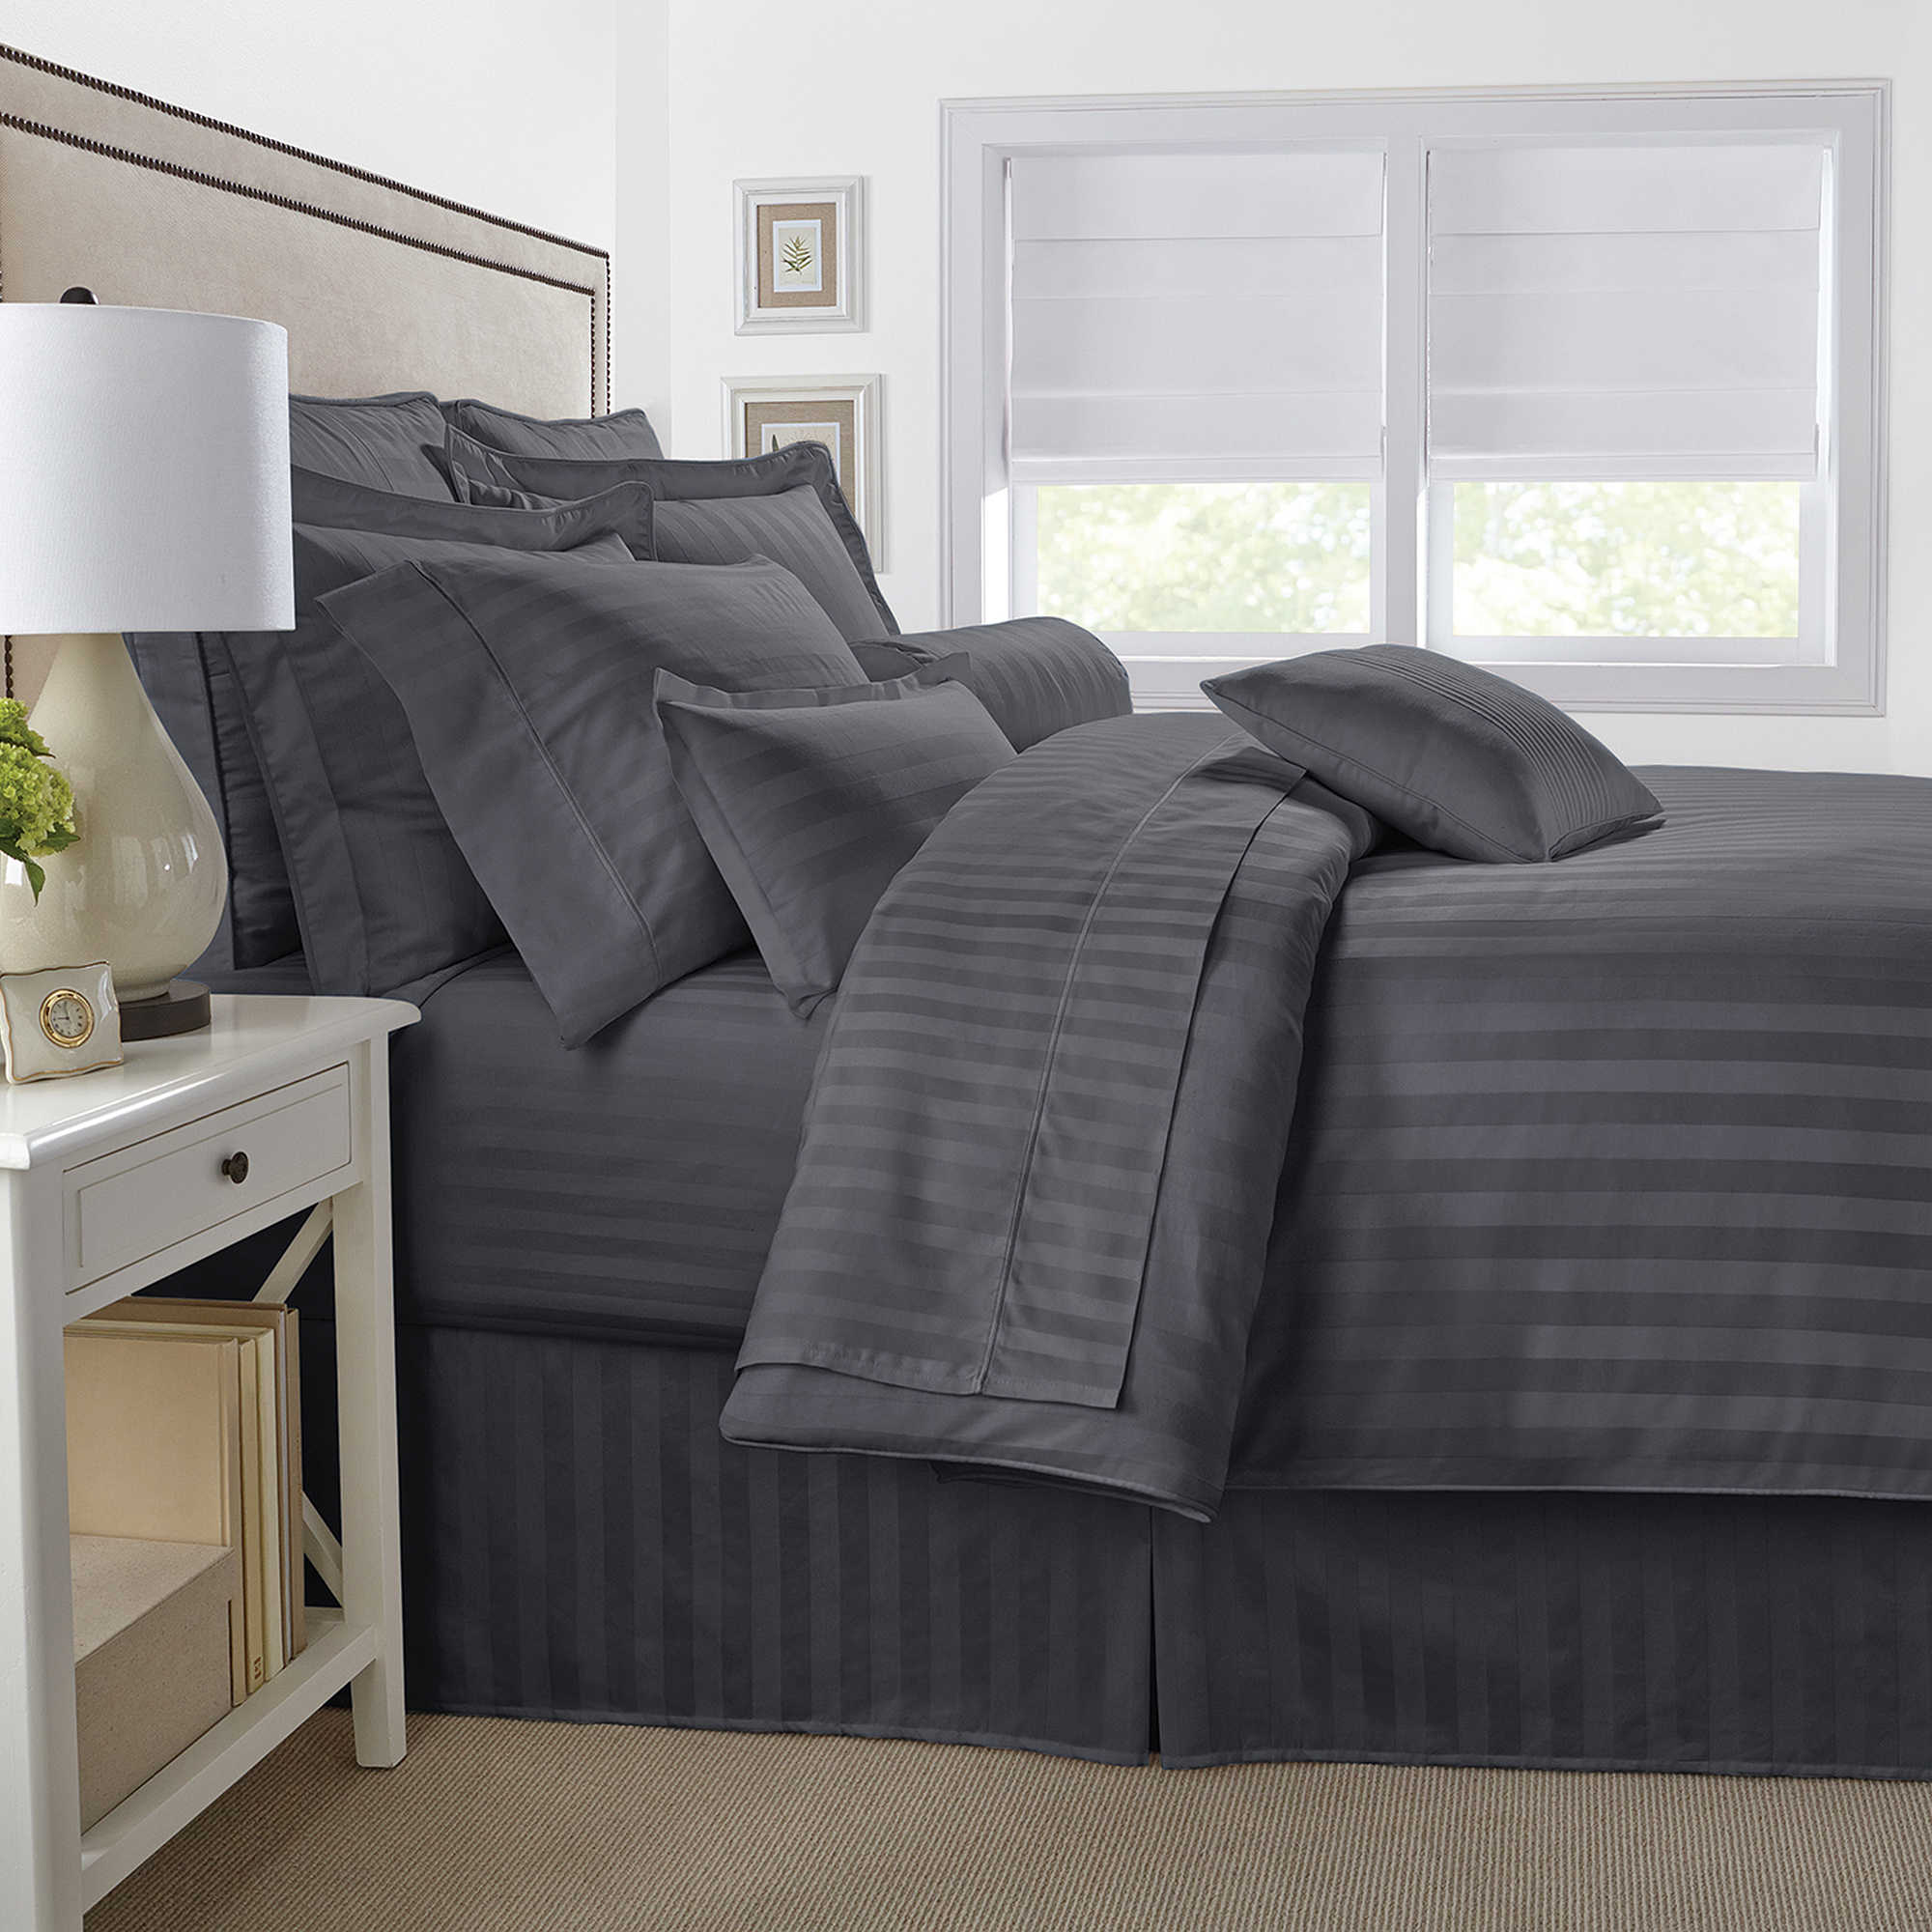 duvet covers  blue duvet cover set  more  bed bath  beyond - image of threadcount damask stripe reversible duvet cover set